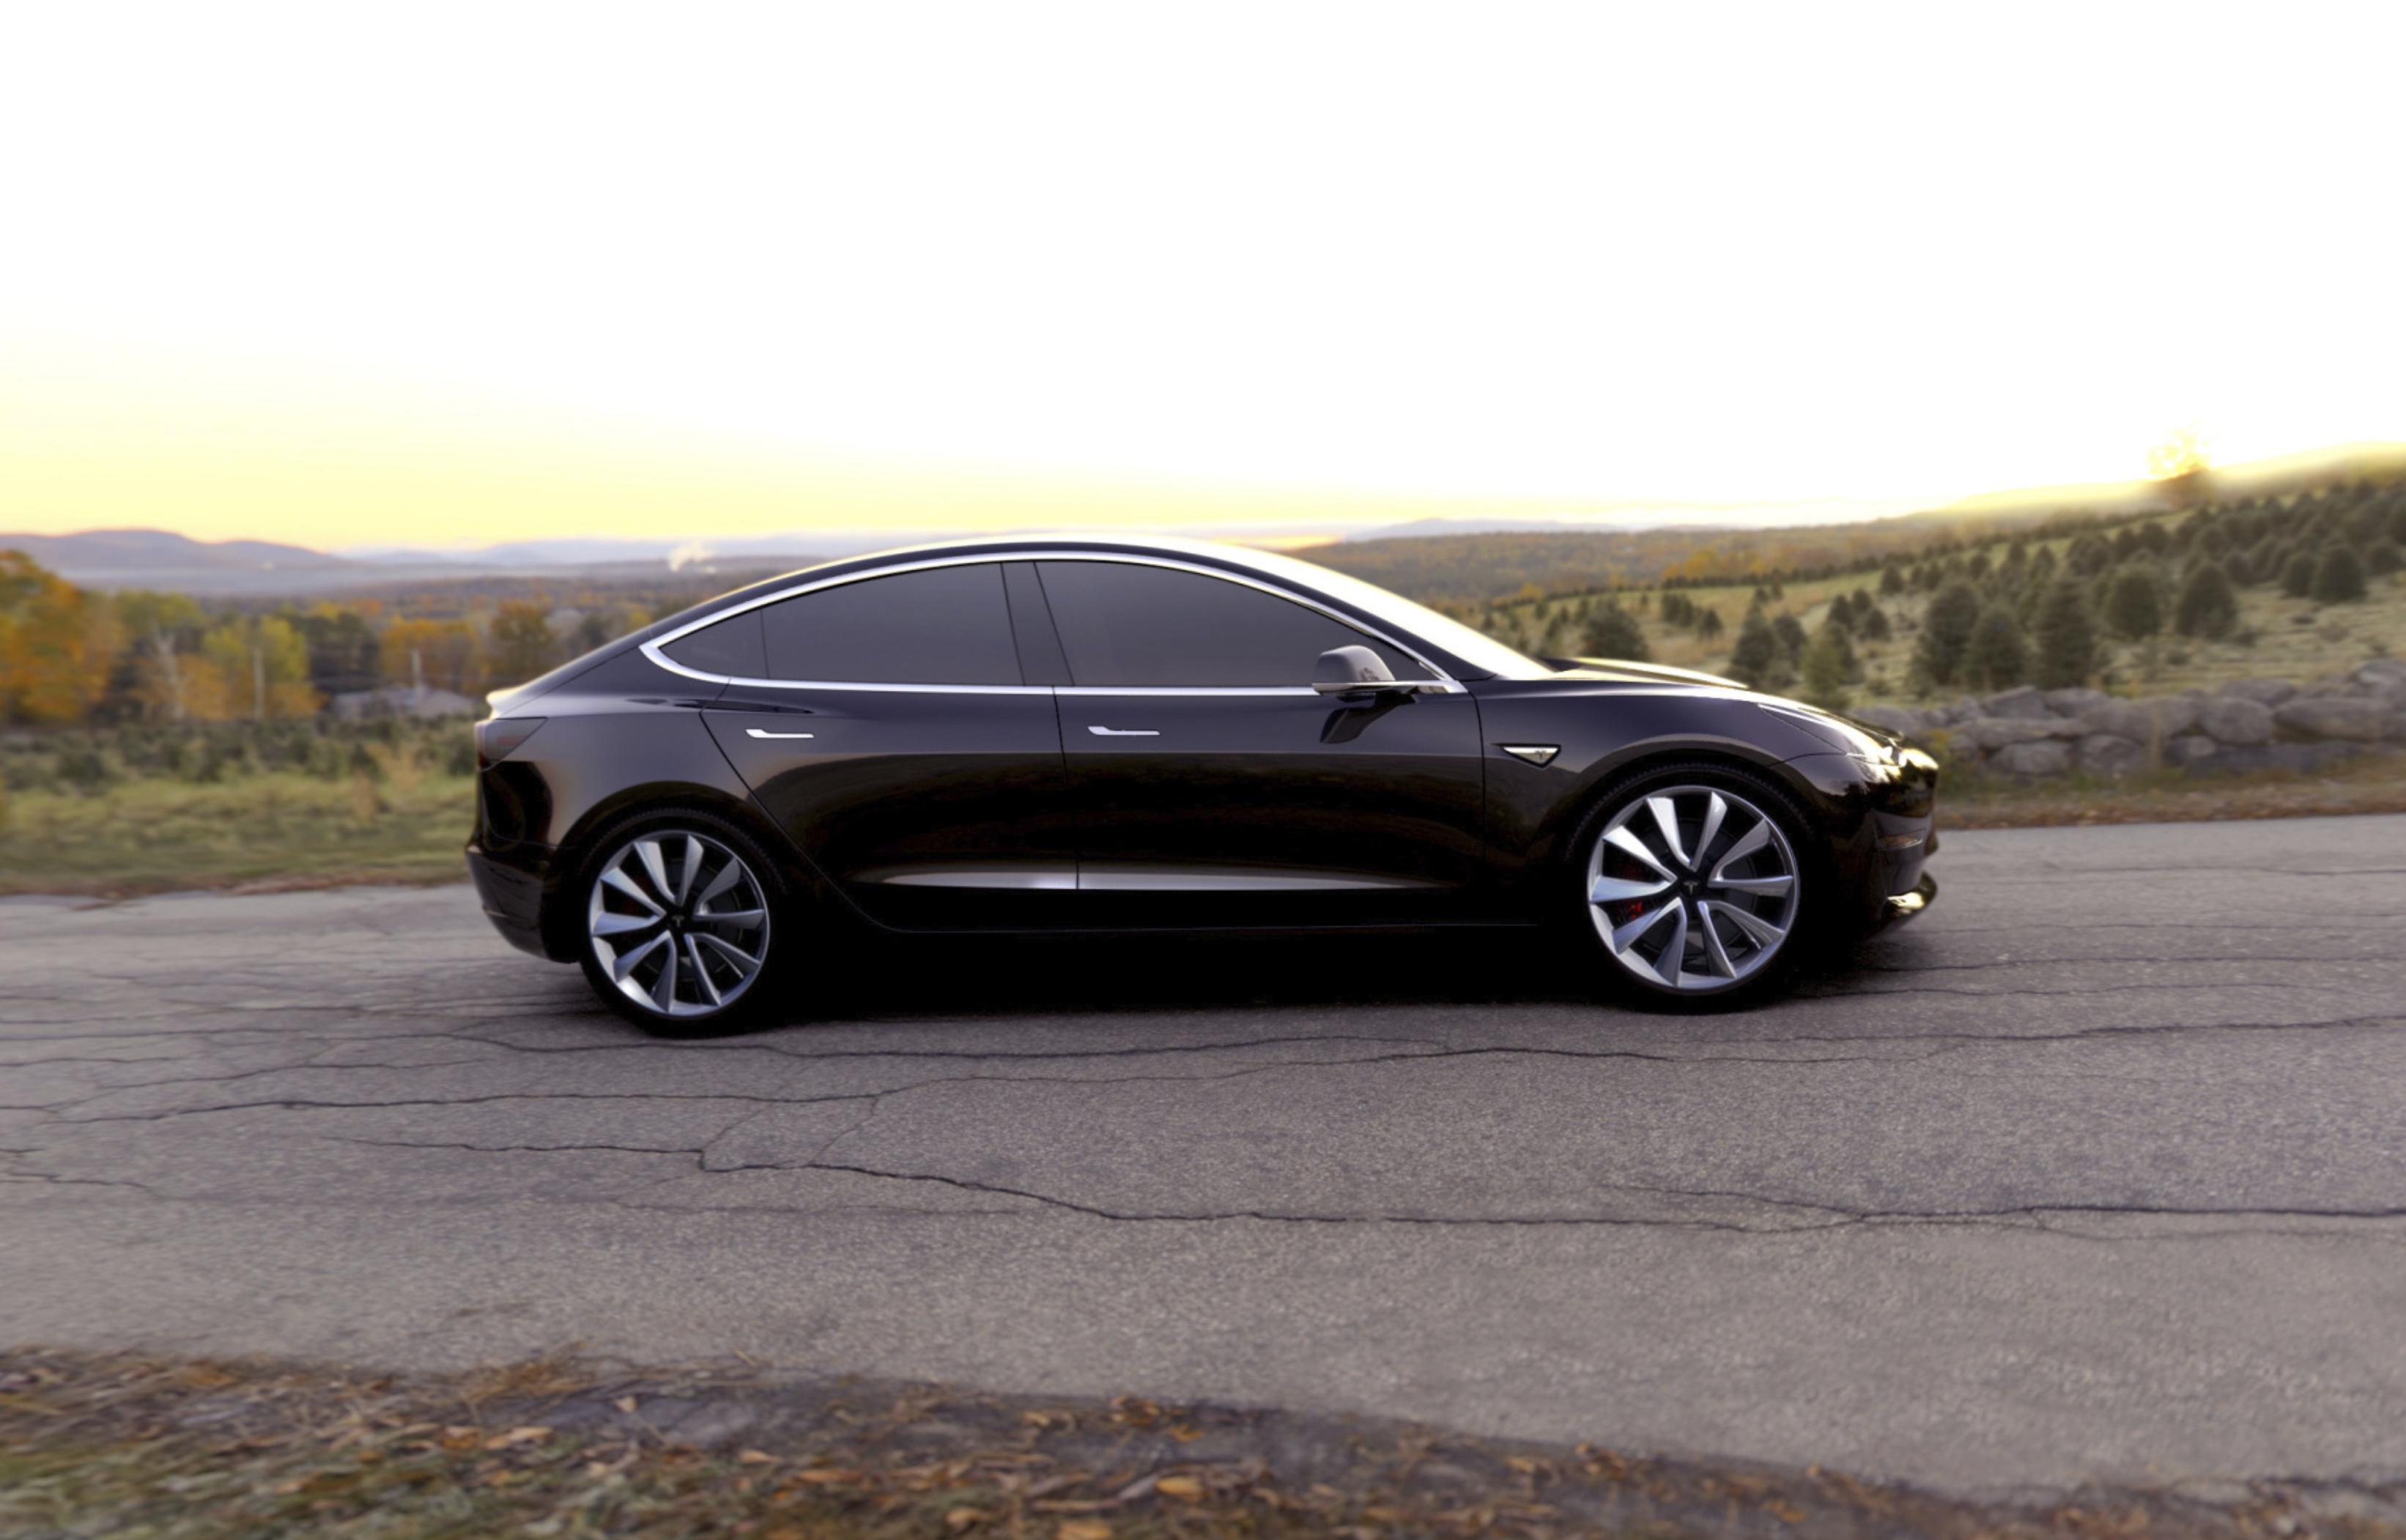 Tesla's Model 3 driving on an empty road.